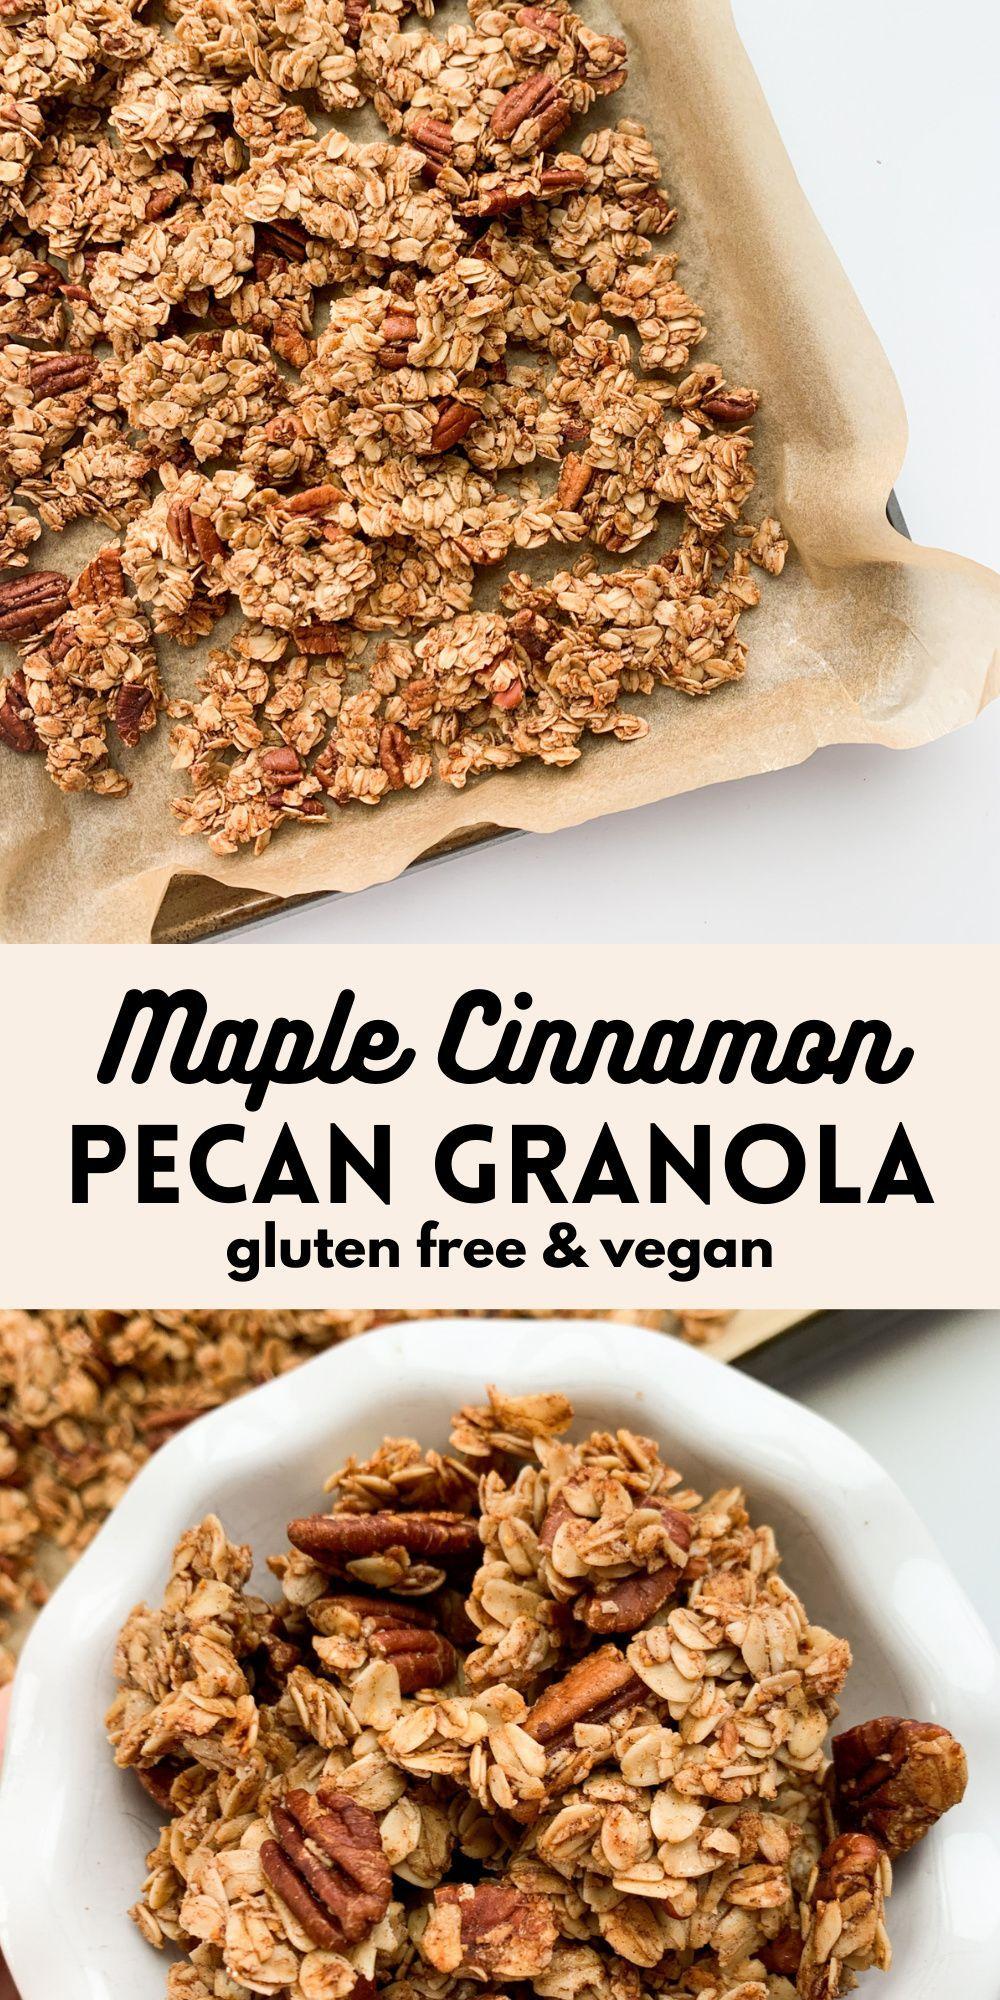 Maple Cinnamon Pecan Granola Wellness By Kay Recipe Granola Recipe Homemade Pecan Granola Recipe Gluten Free Dairy Free Breakfast